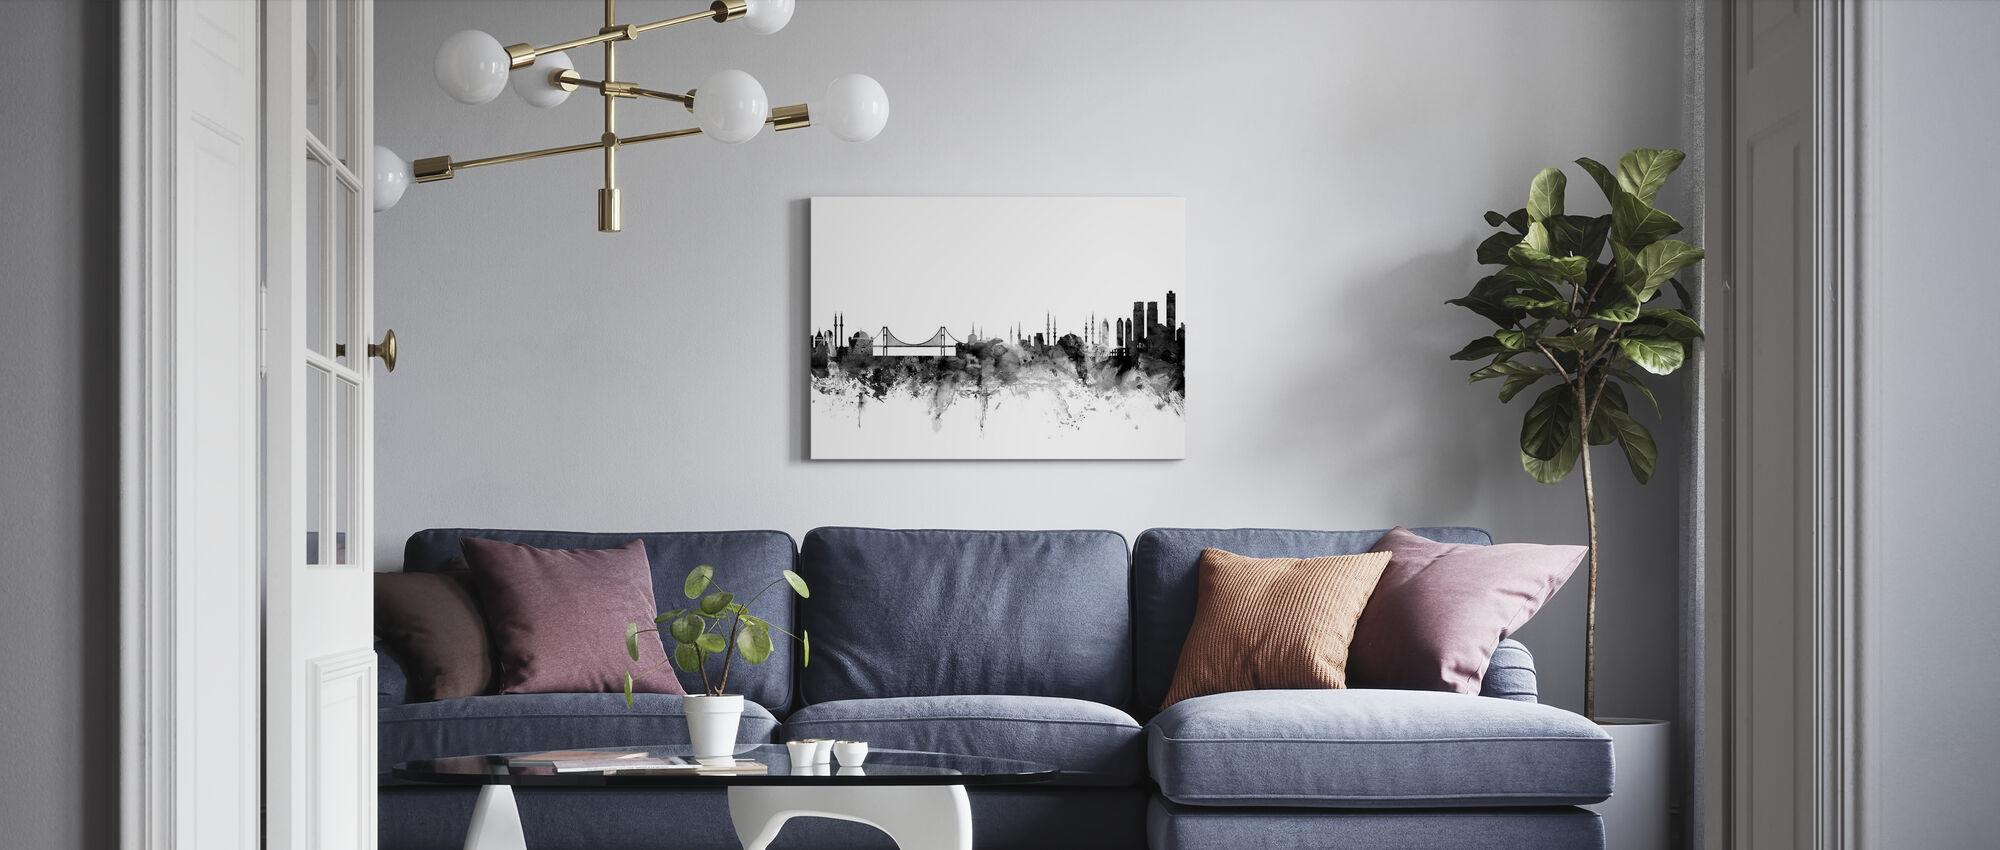 Istanbul Skyline Svart - Canvastavla - Vardagsrum